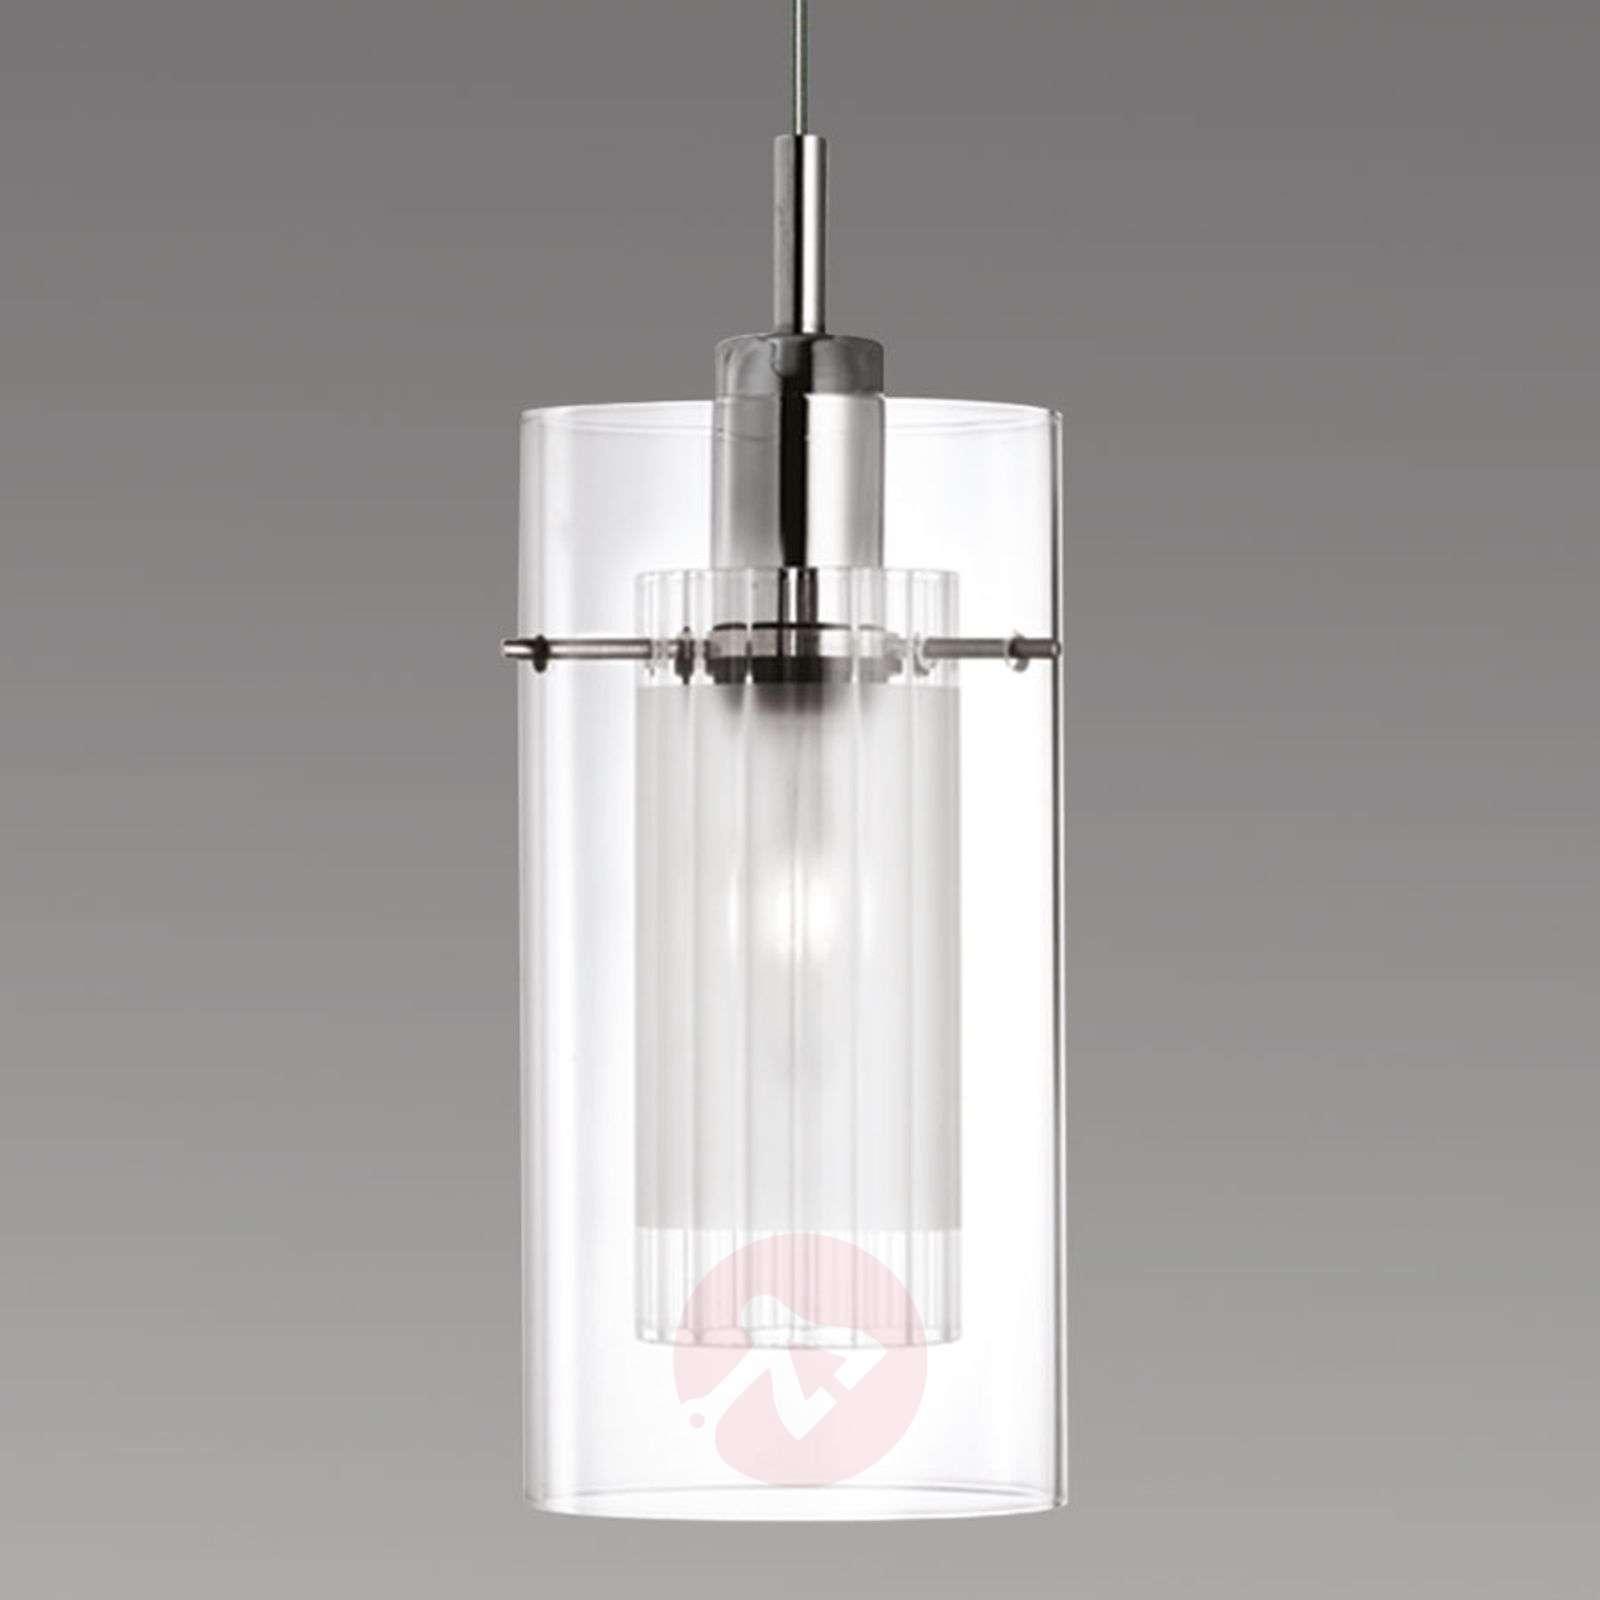 Decorative Duo 1 hanging light, 1-bulb-8570304-01